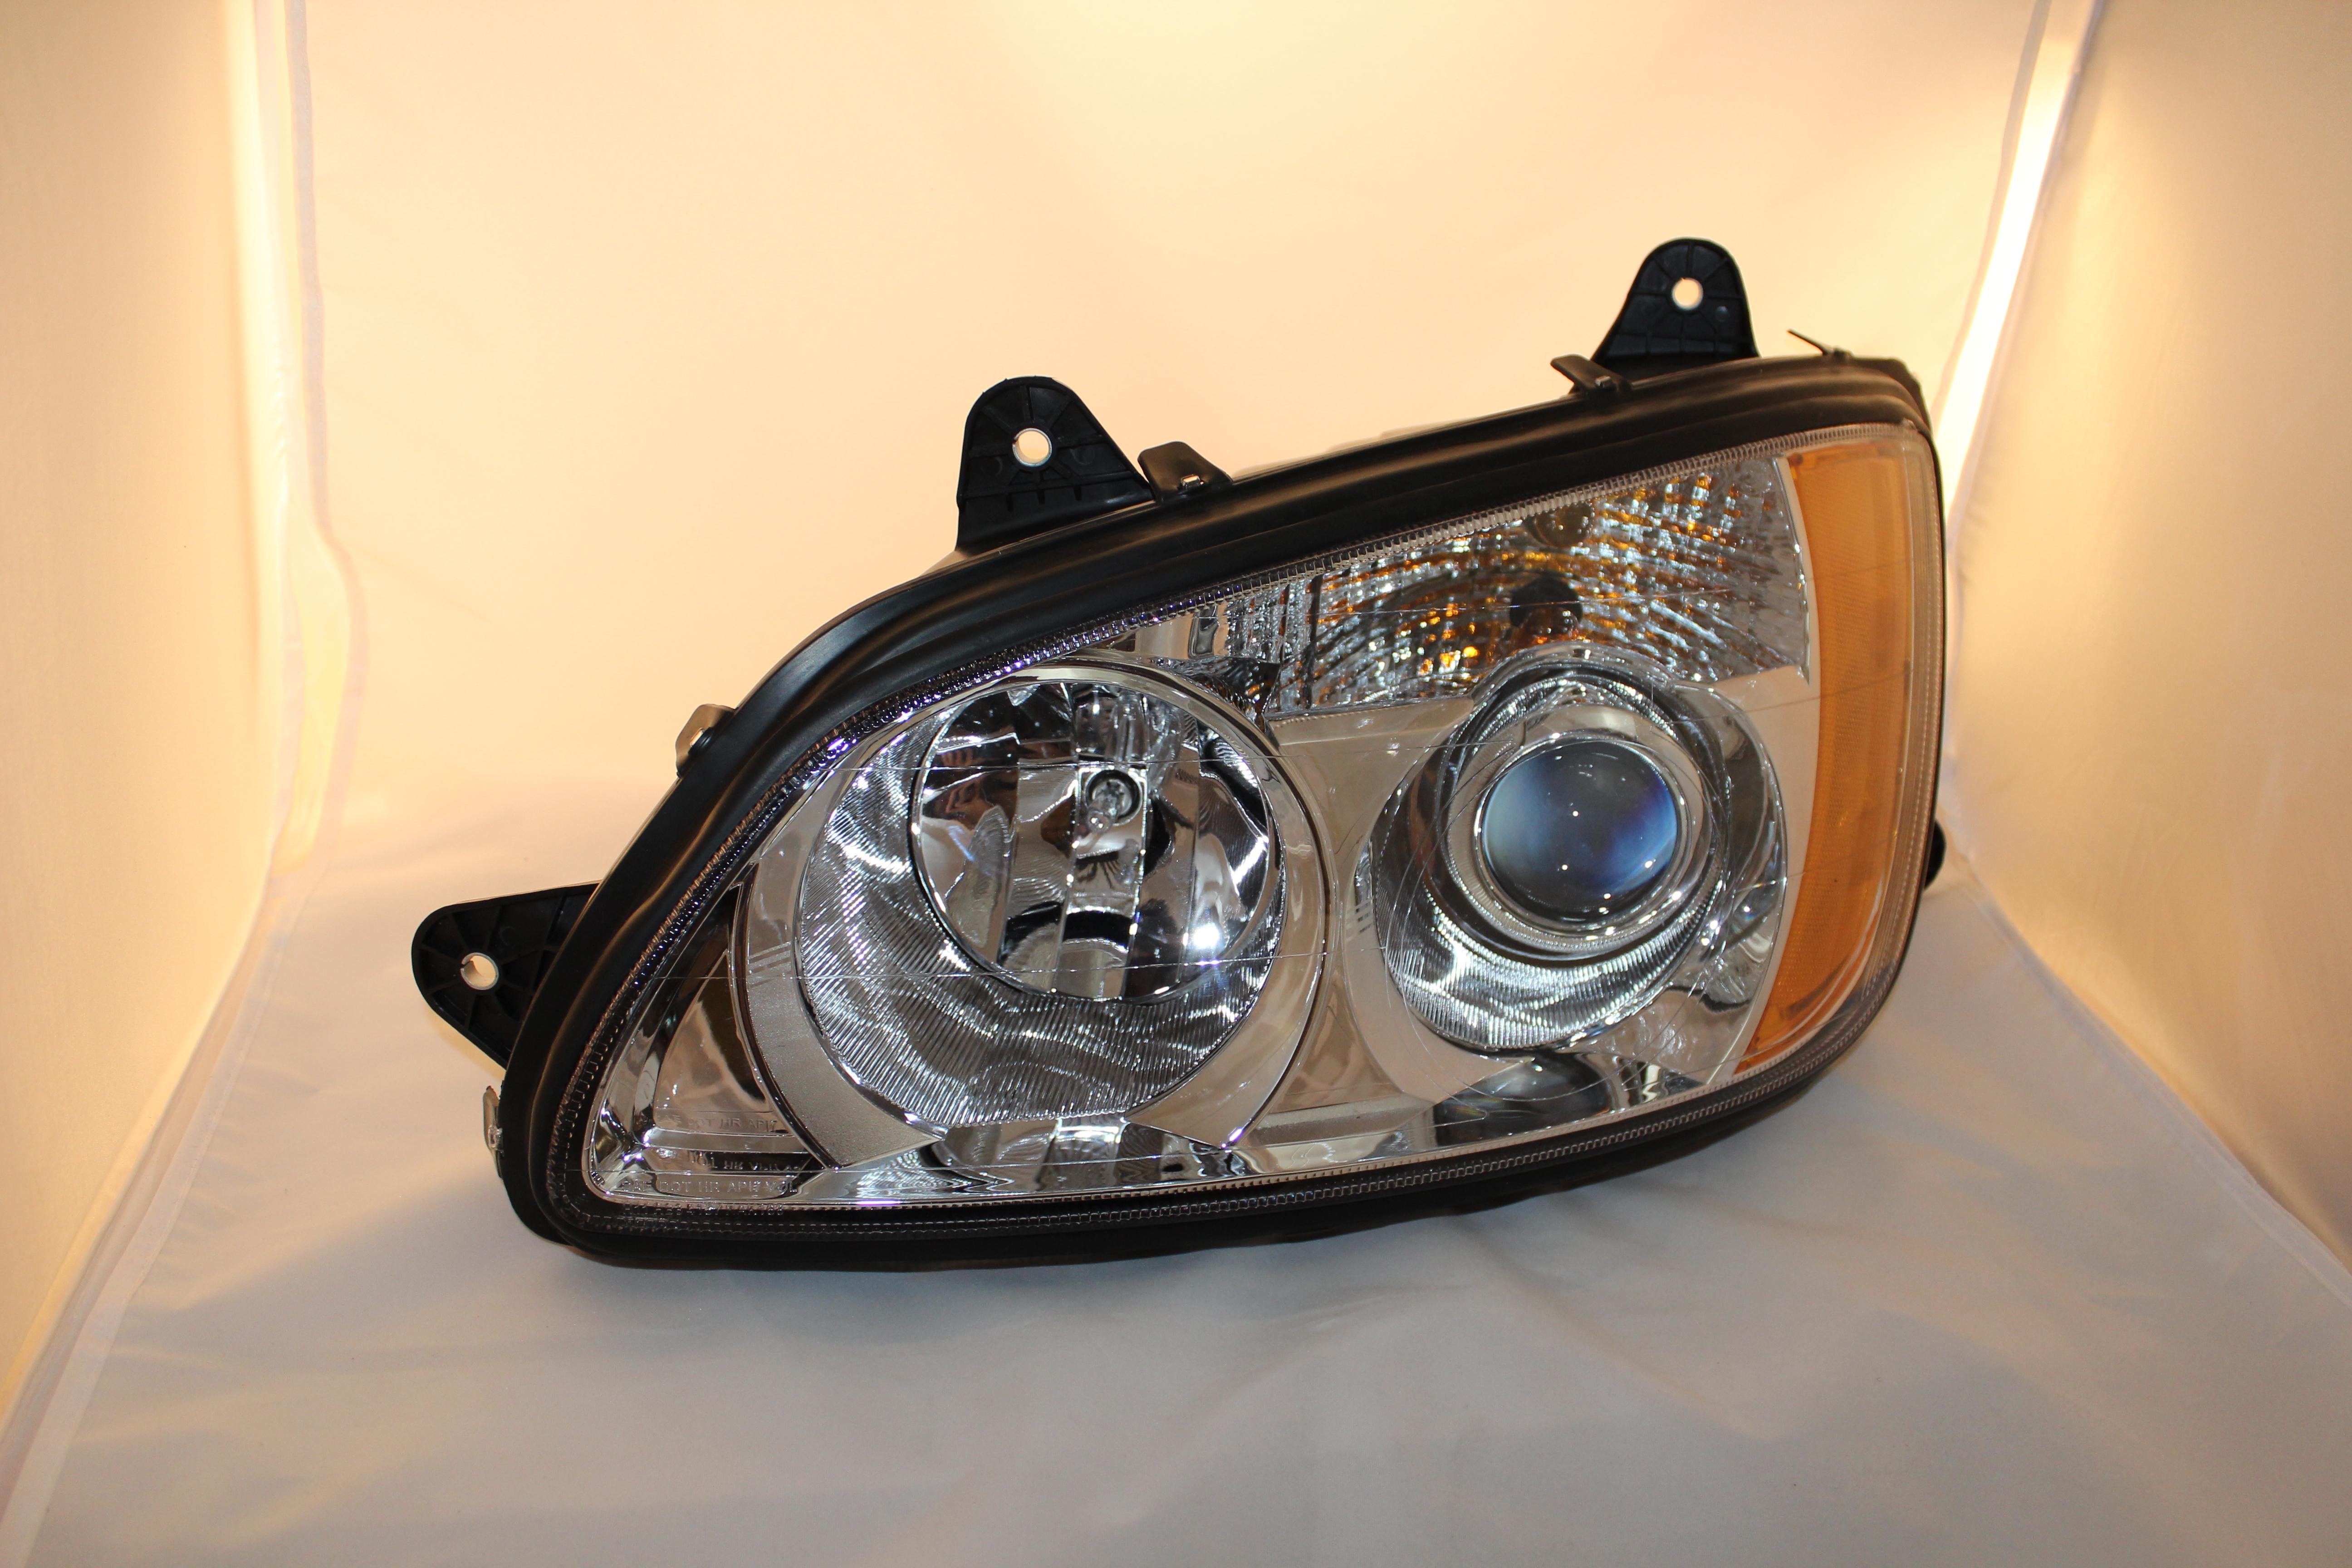 Kenworth T660 T700 Bi-Xenon Headlight Upgrade Kit - Deep Space Lighting